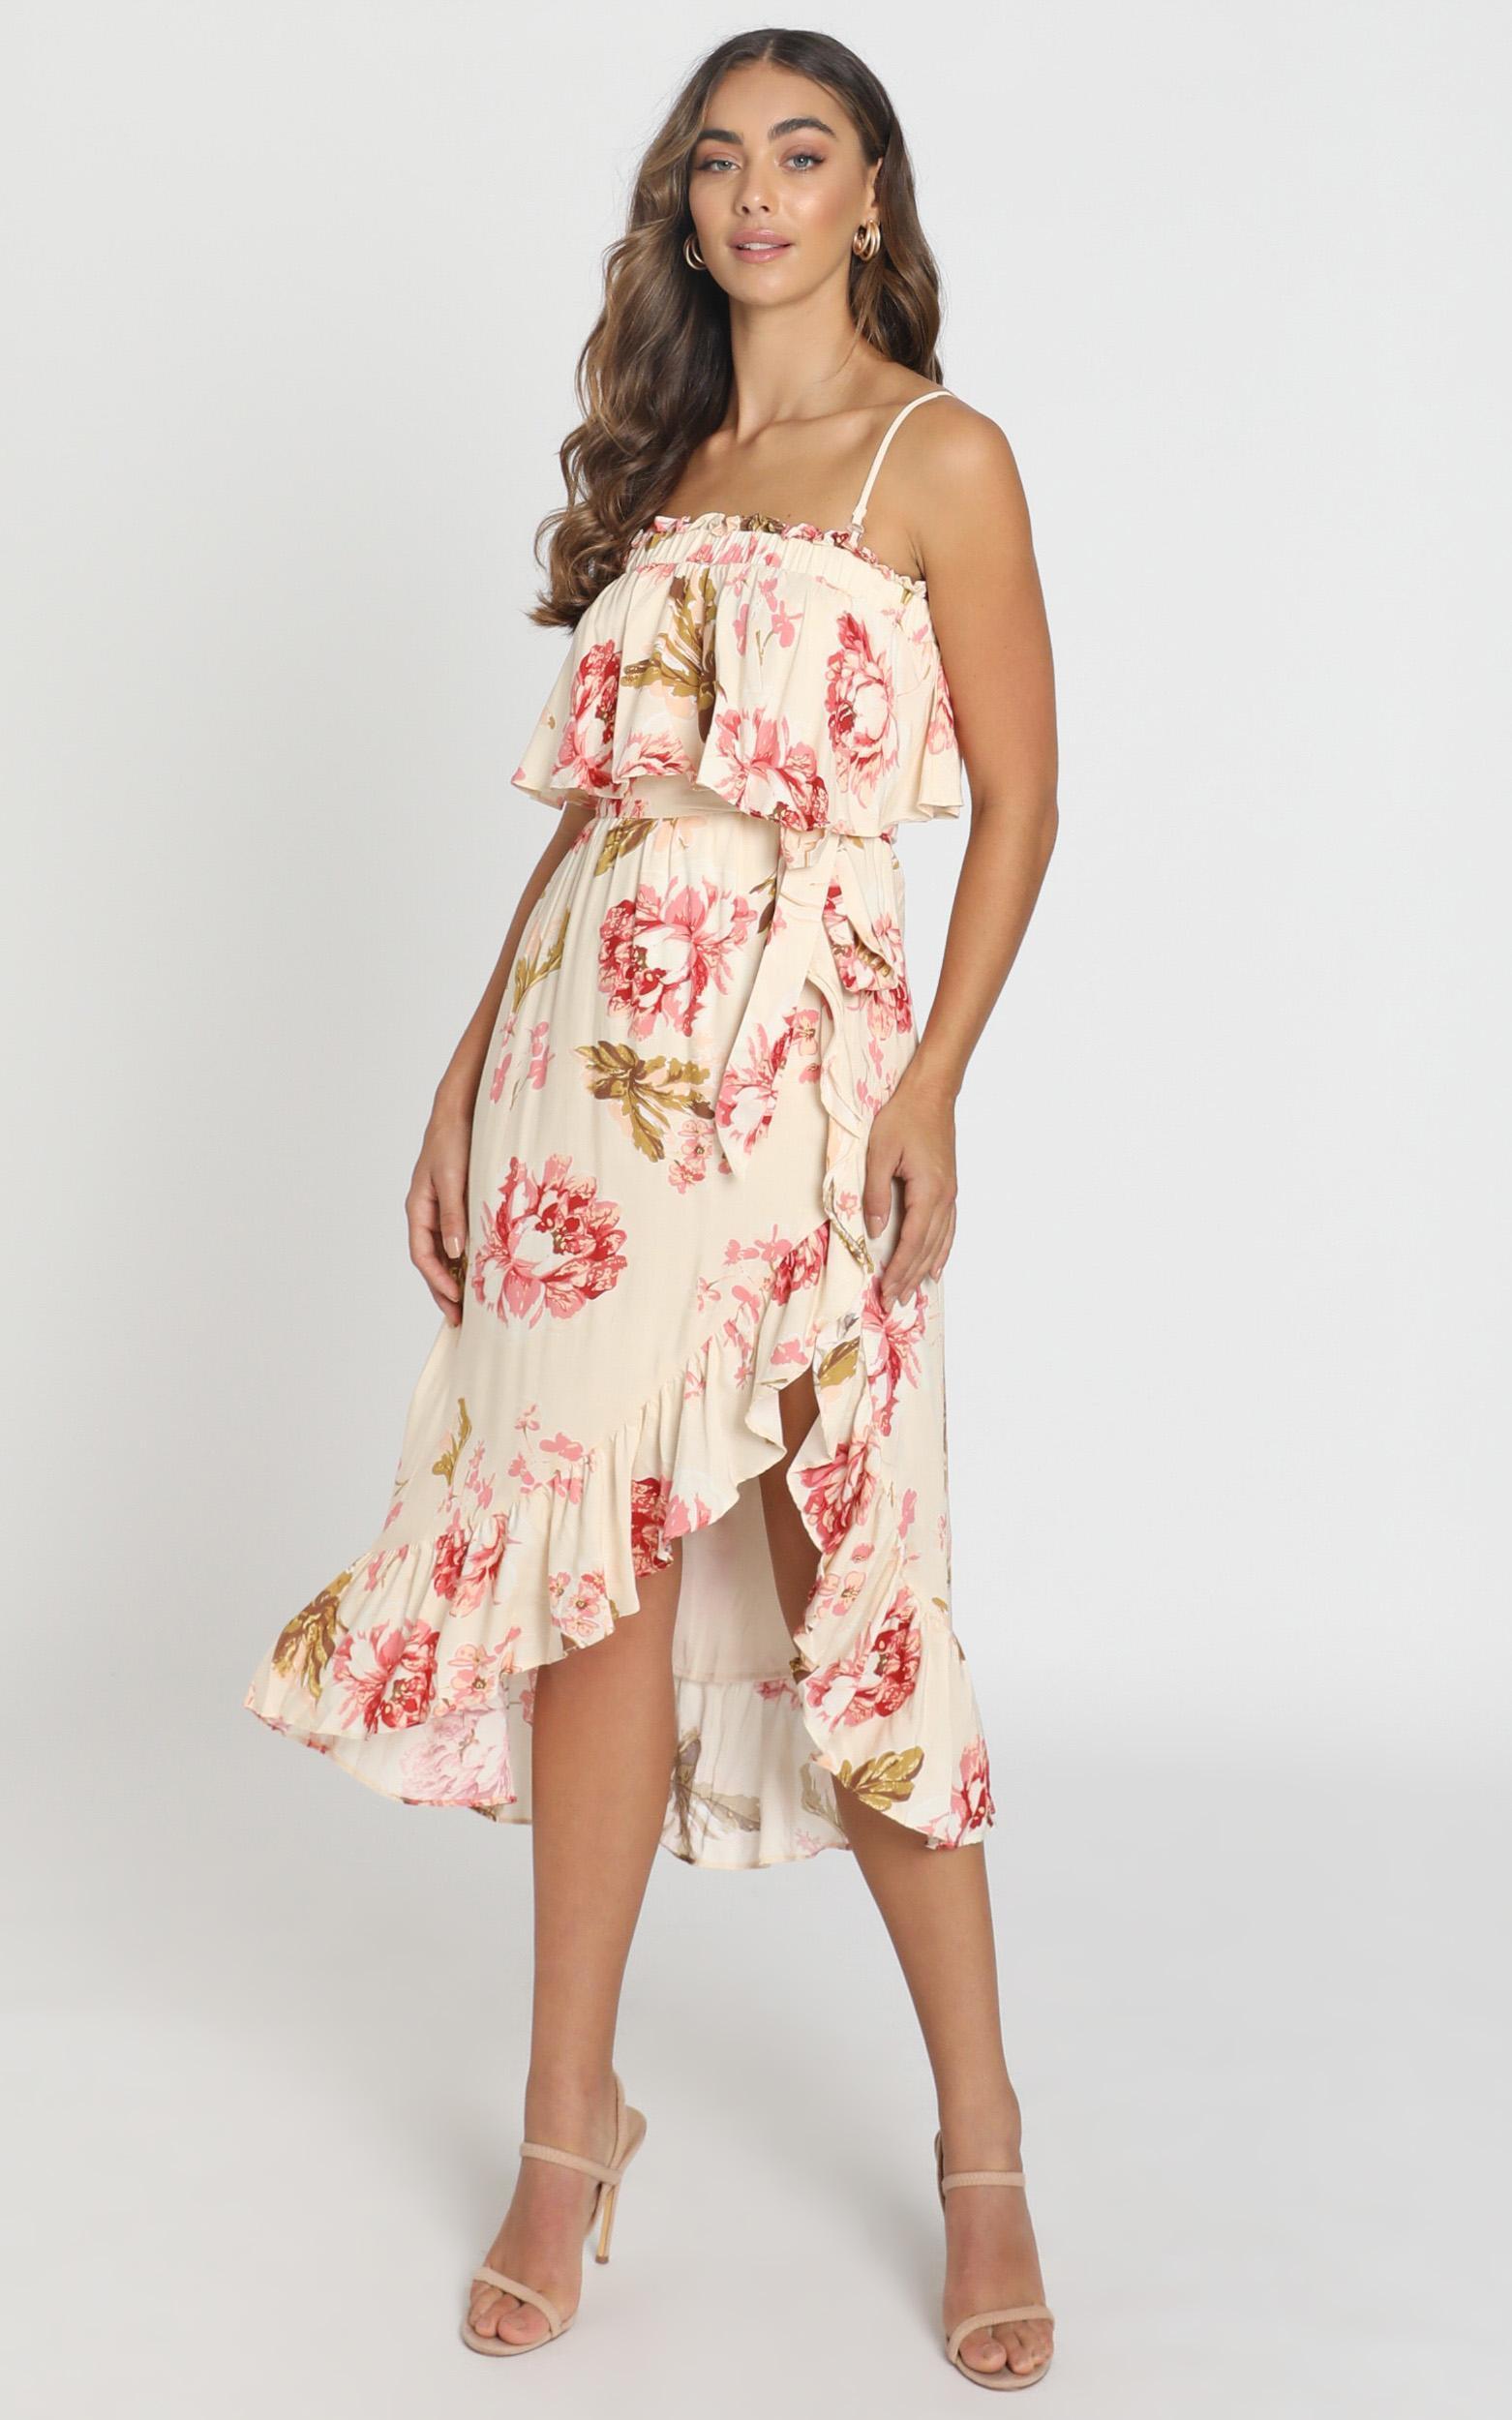 Aderyn Midi Dress in beige floral - 6 (XS), Beige, hi-res image number null